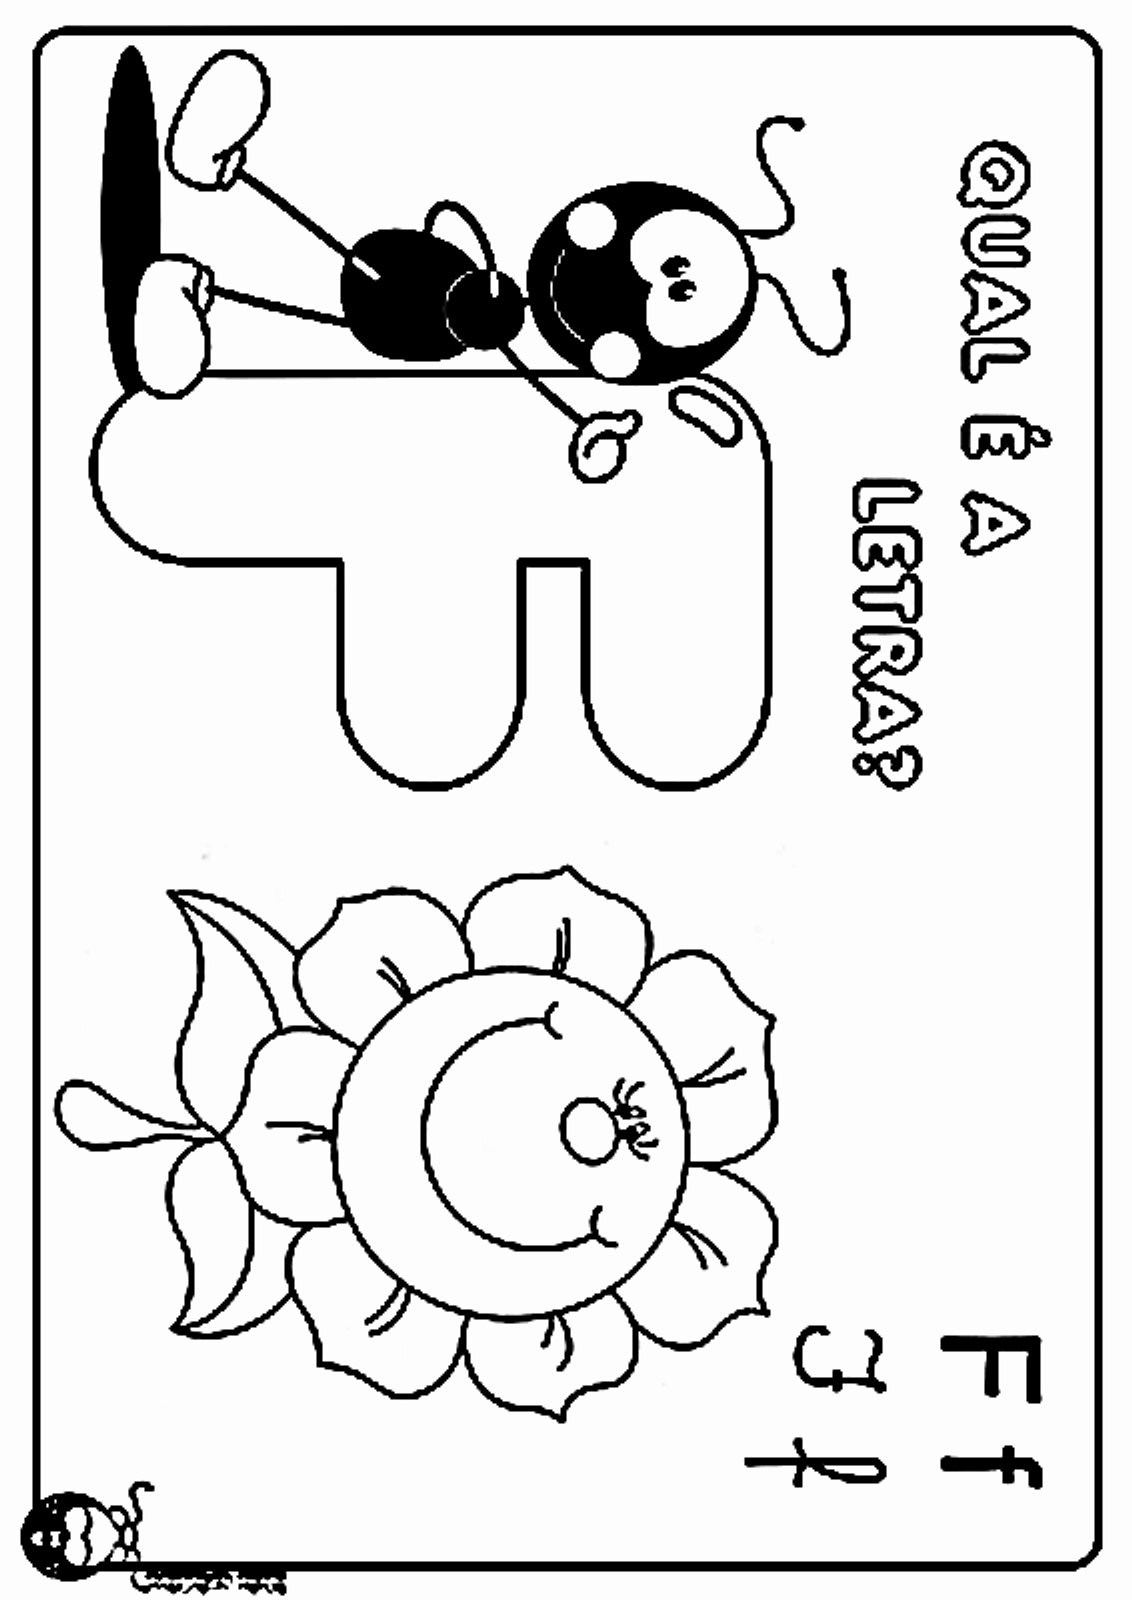 Desenhos Para Colorir letras do alfabeto letra F